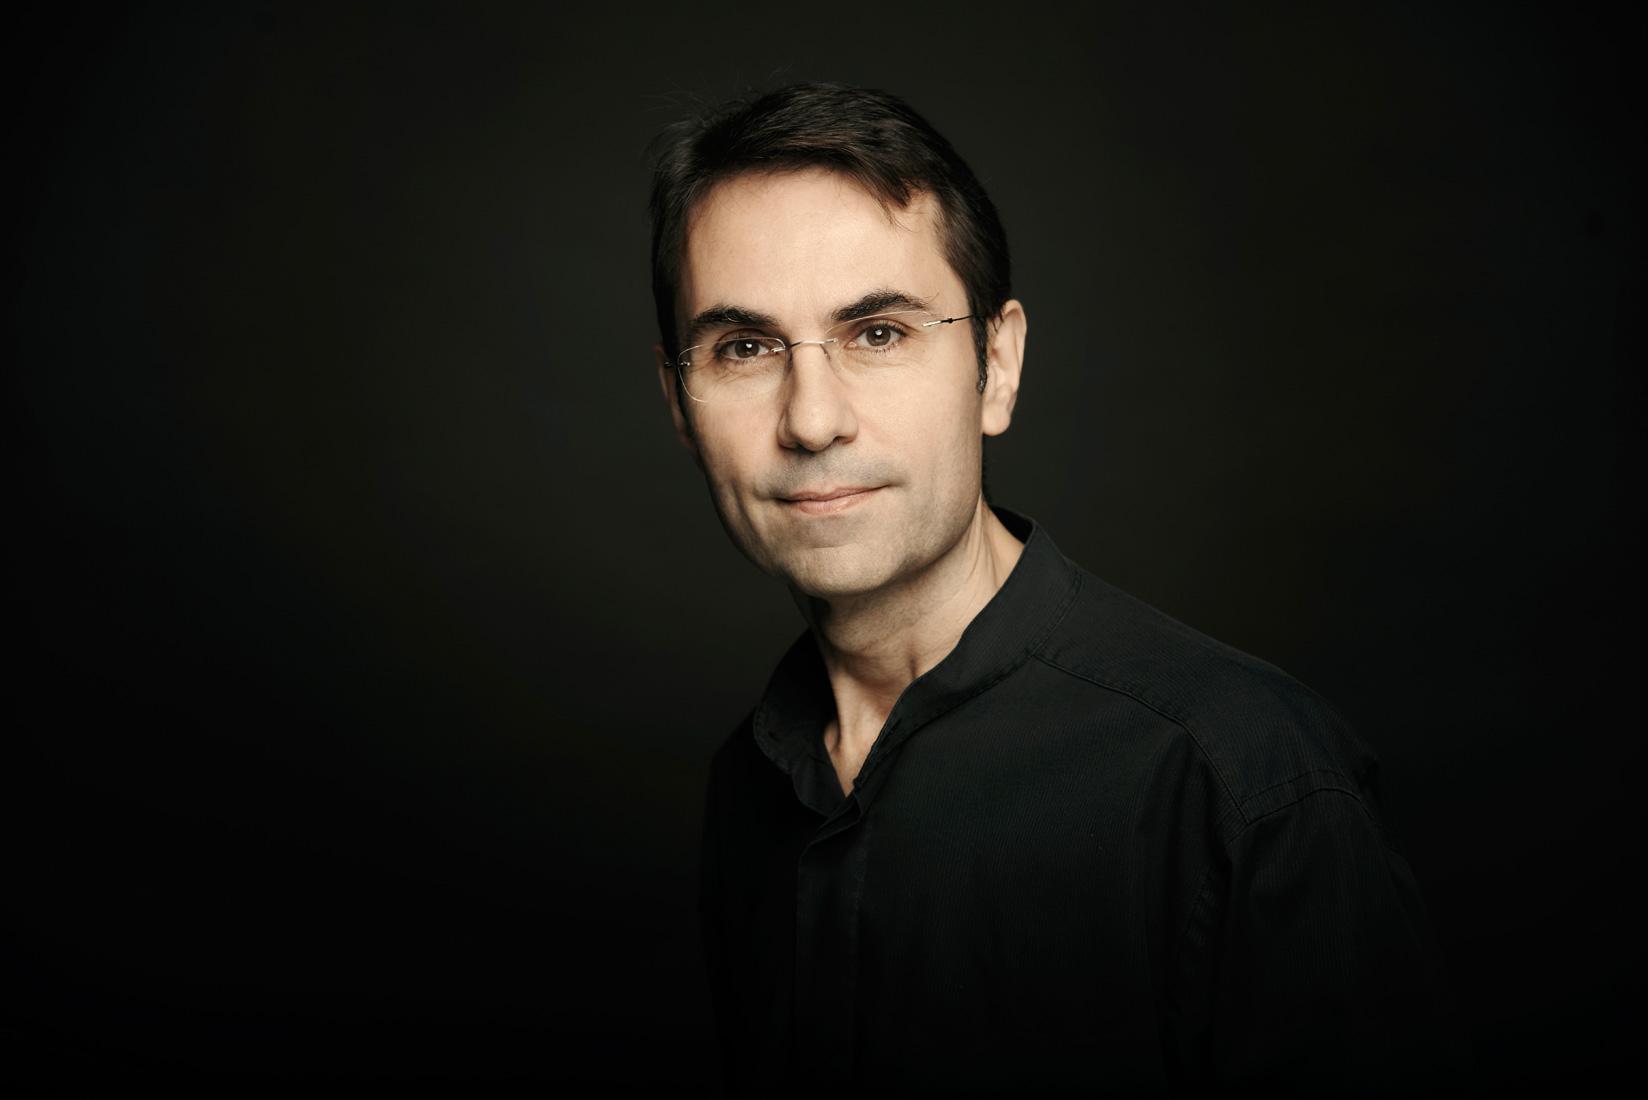 Raúl Pérez Piera